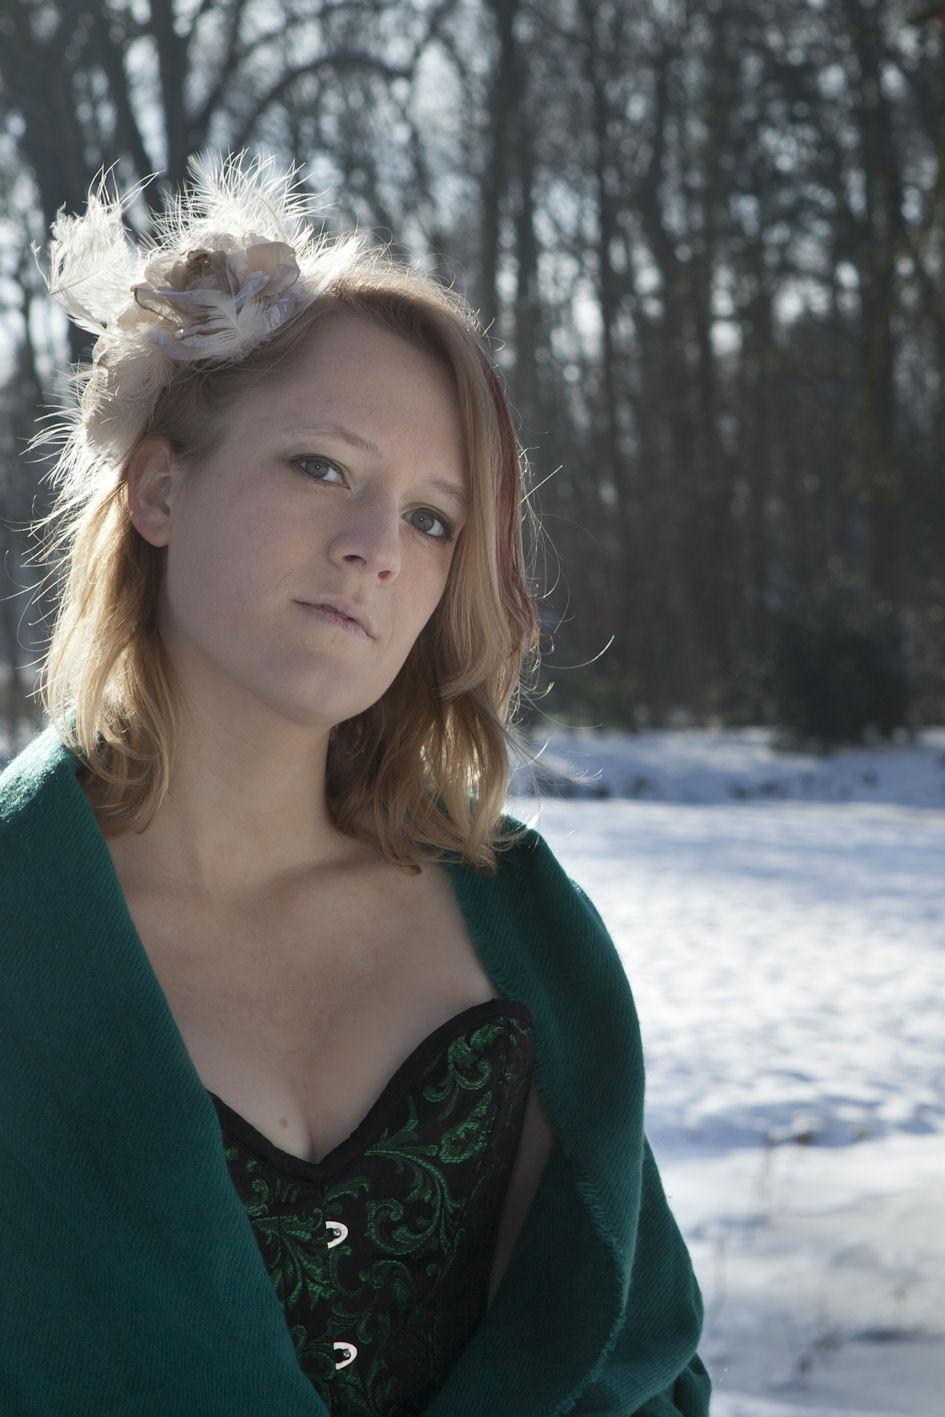 Icedrop21's Profile Picture